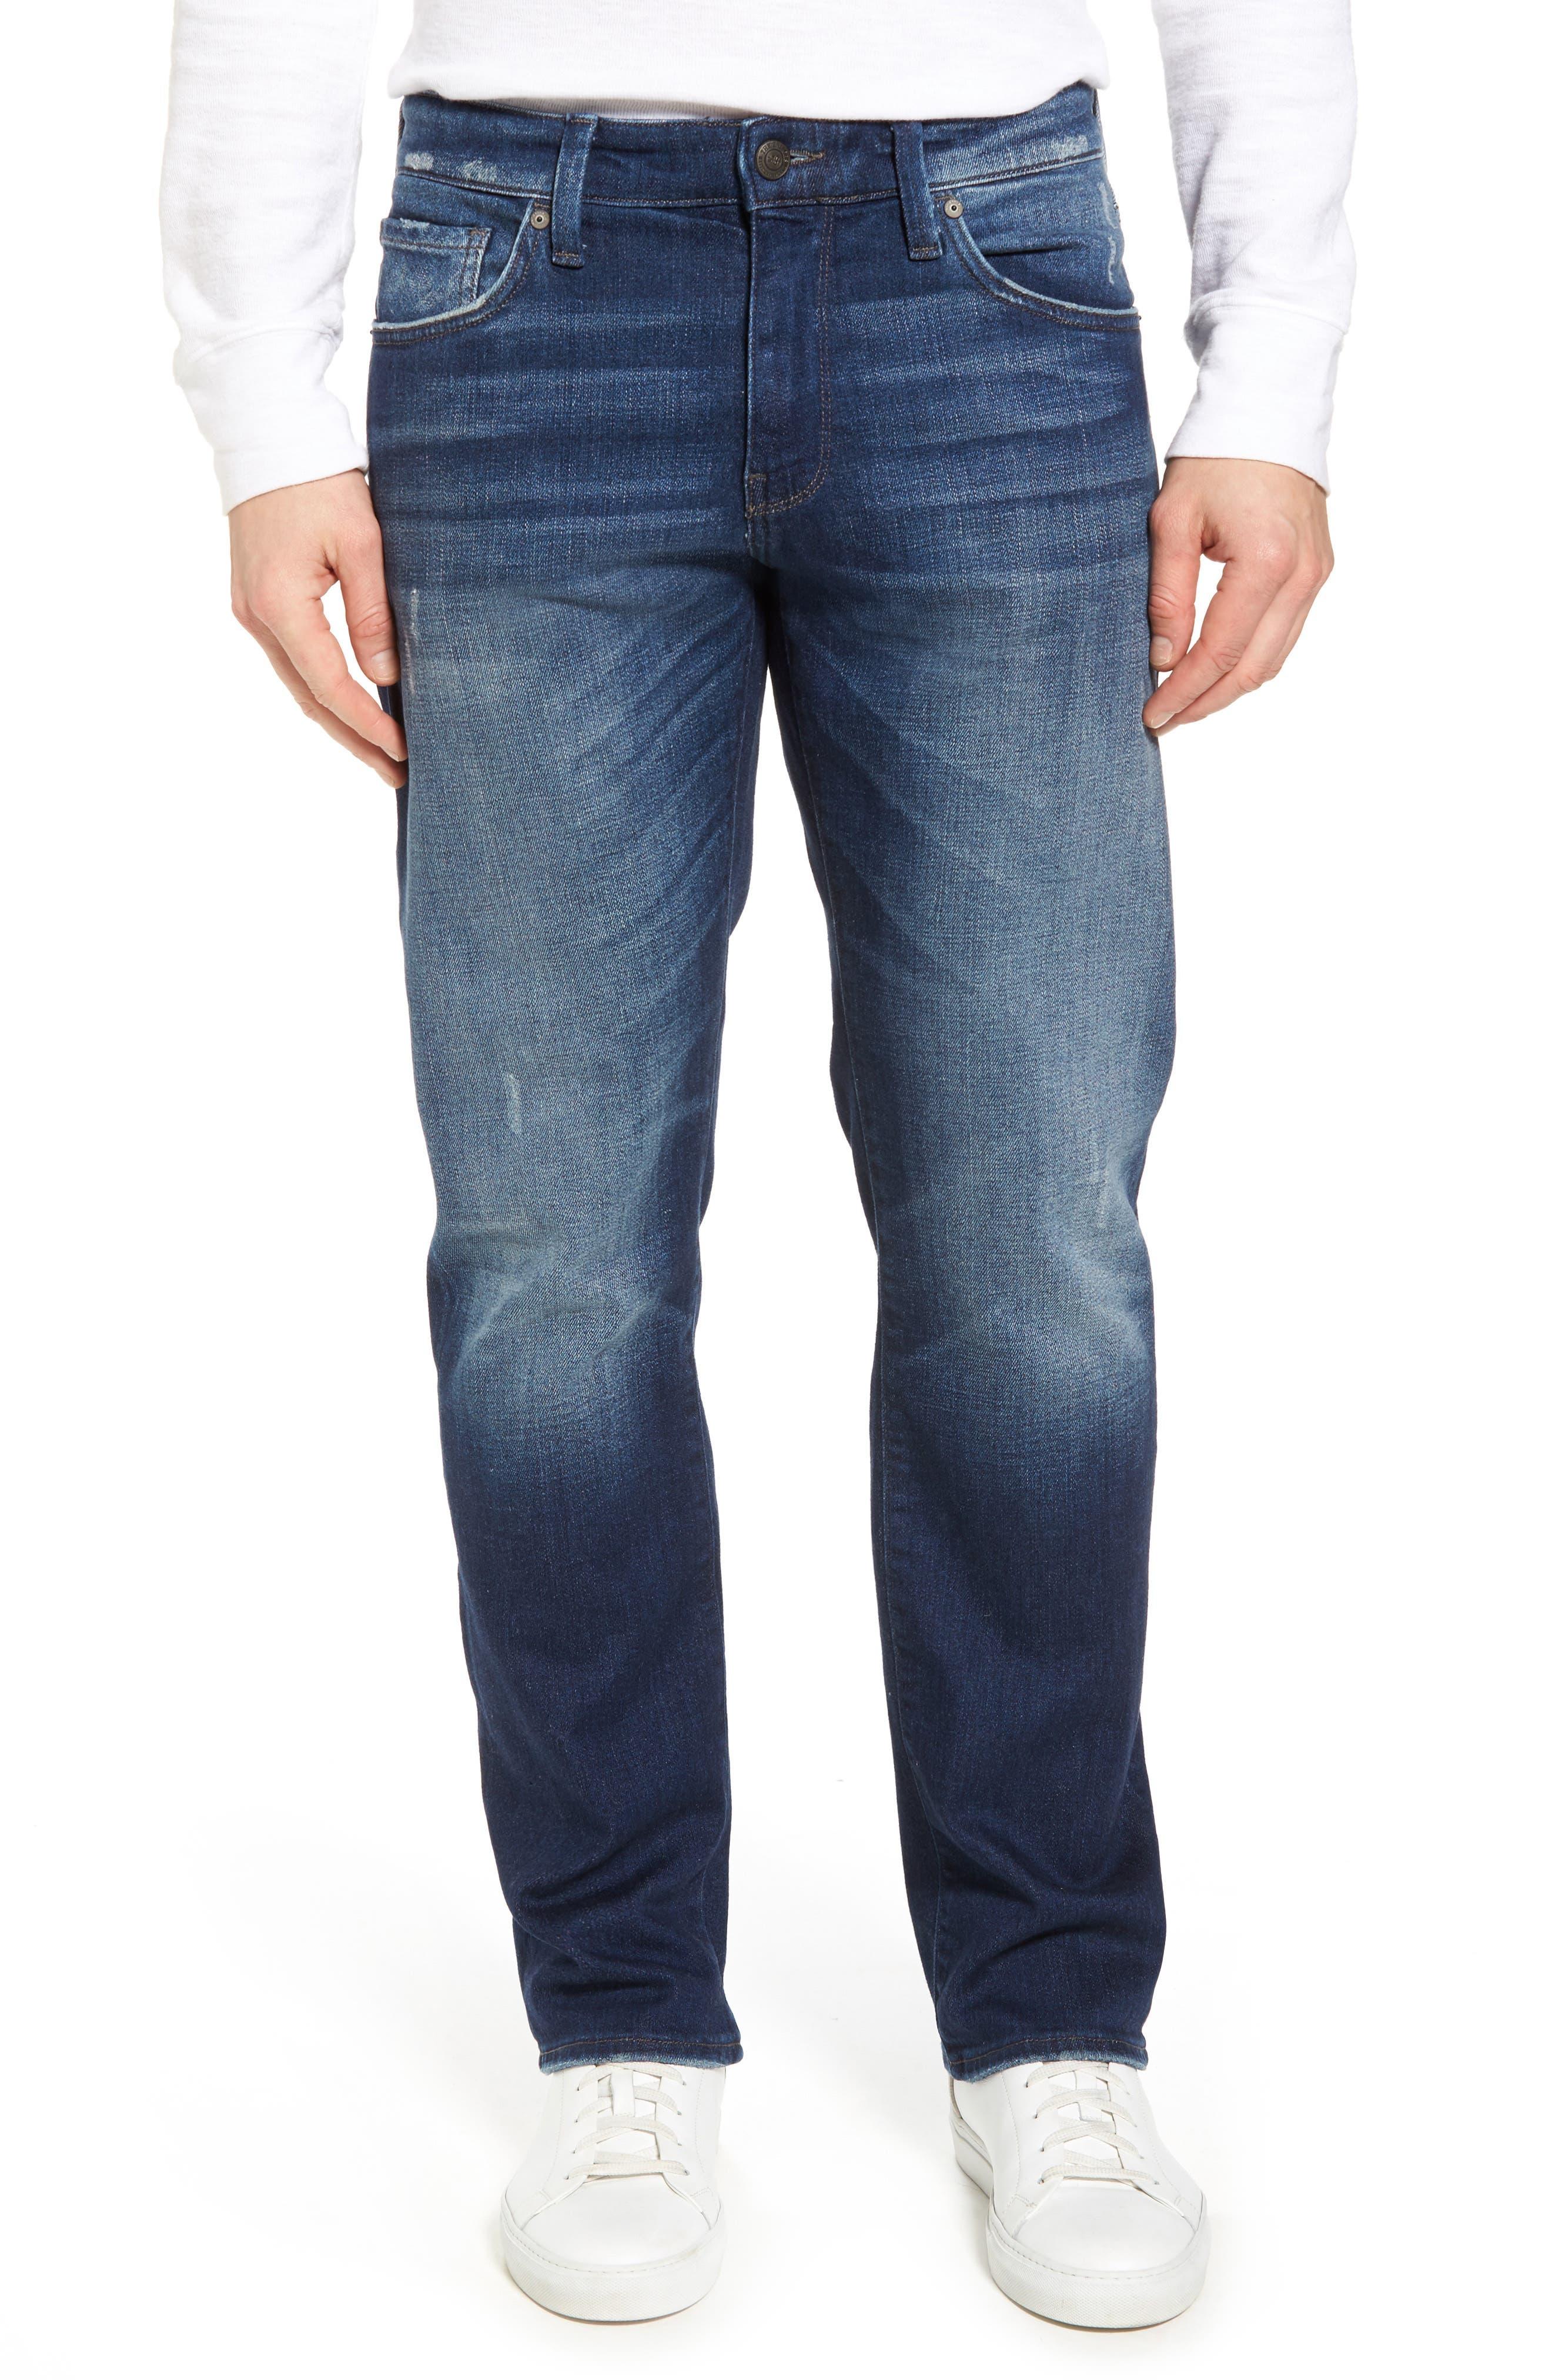 Zach Straight Leg Jeans,                             Main thumbnail 1, color,                             400